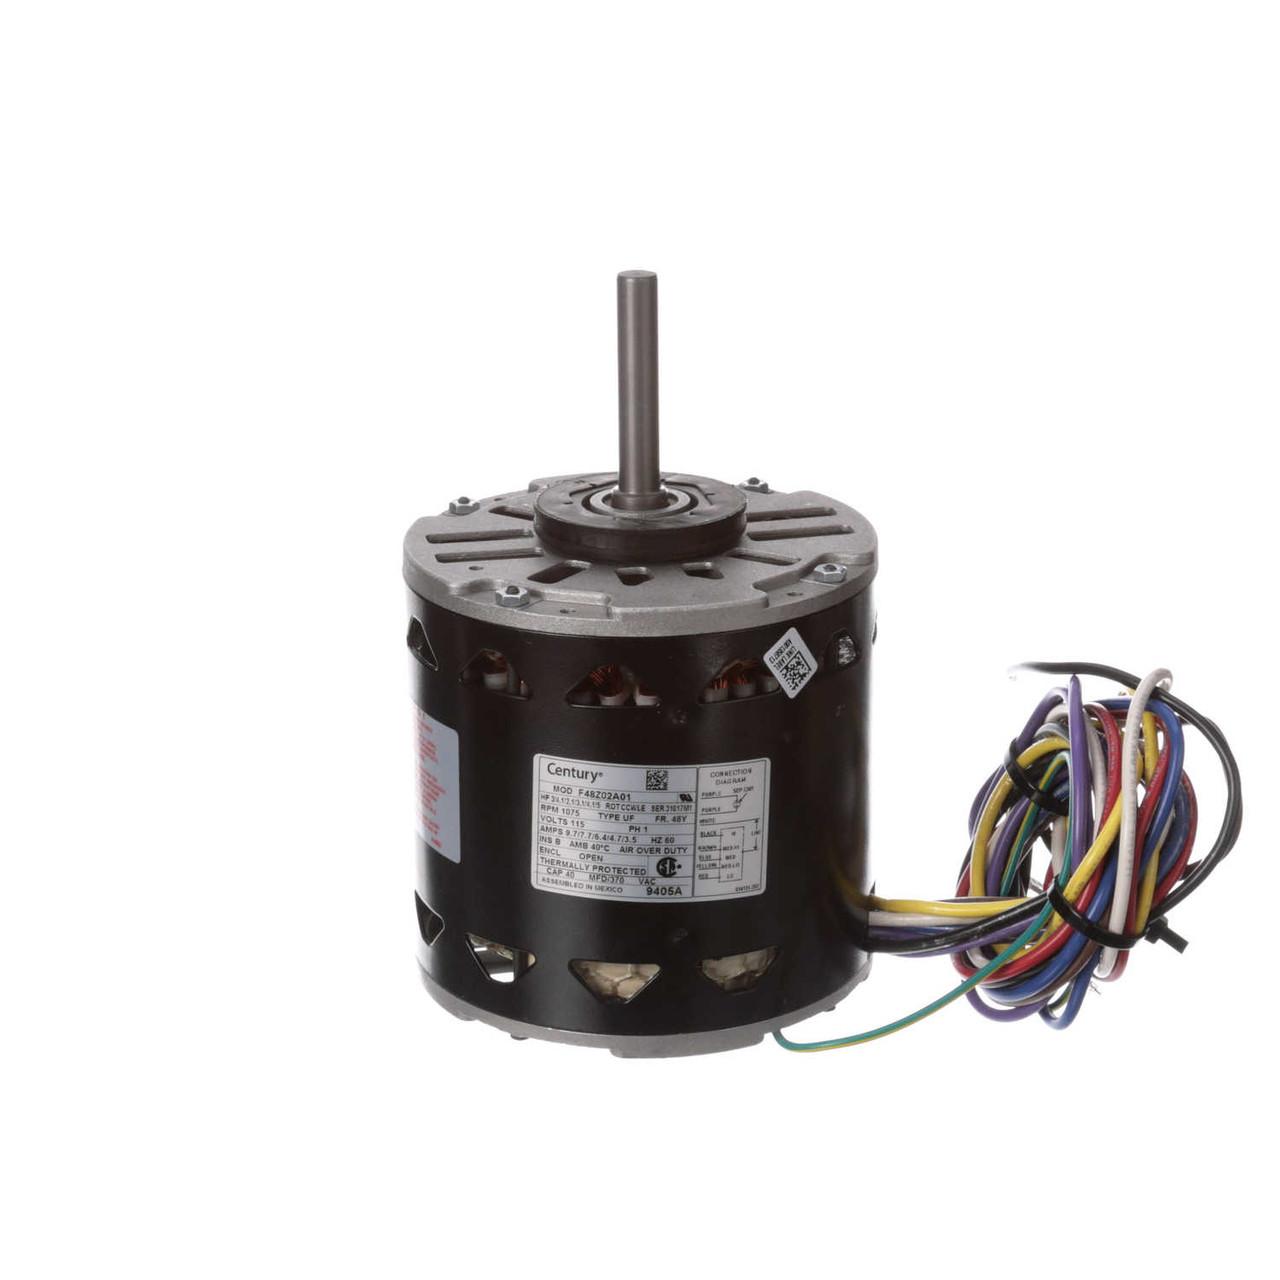 hight resolution of lennox k55hxnnz 7057 furnace motor 3 4 hp 1075 rpm 115v century 9405a